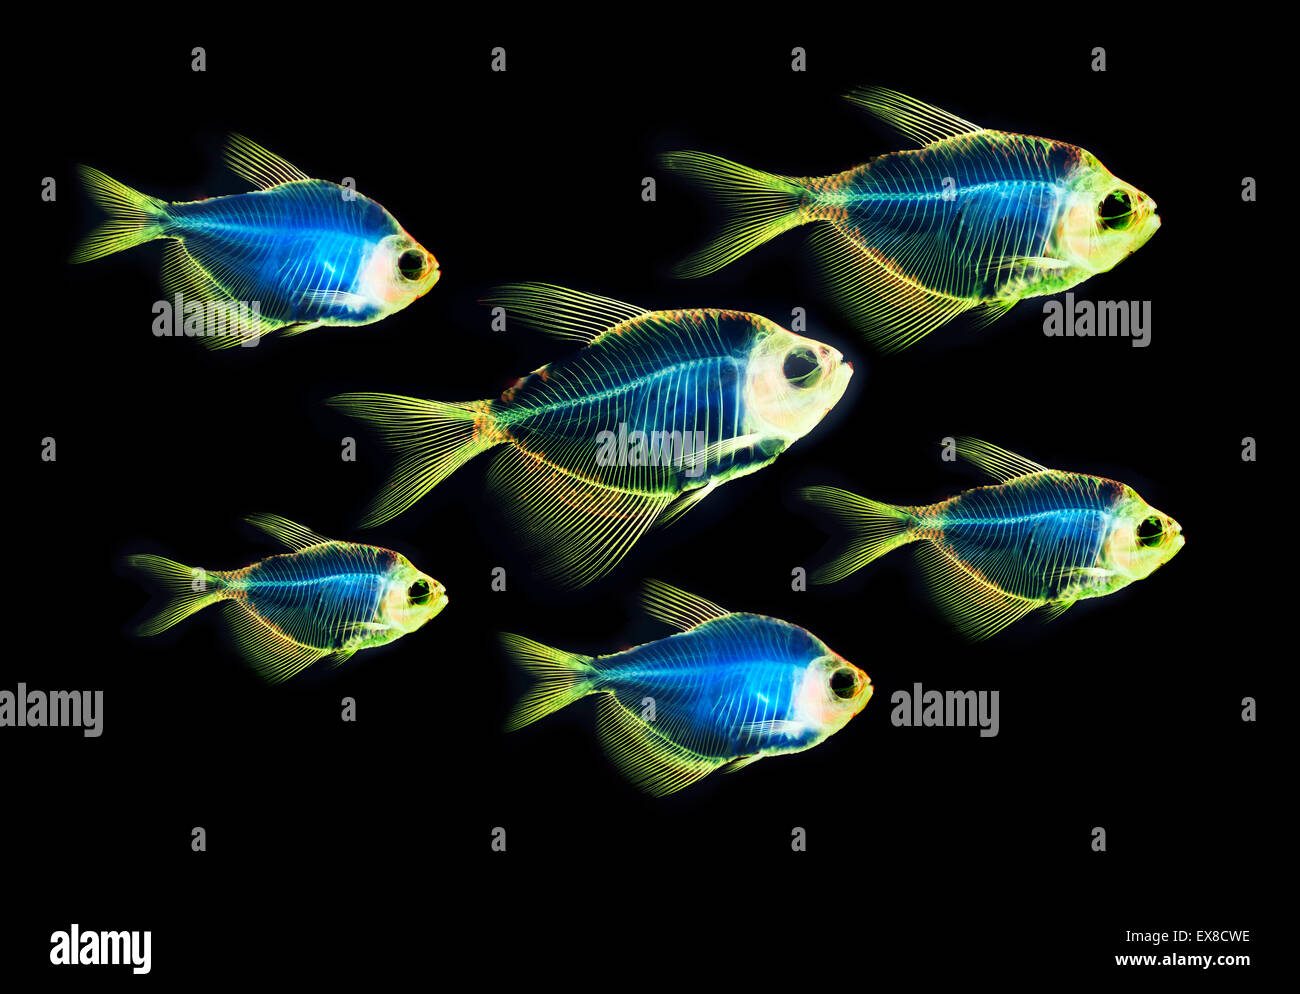 Fisch Skelett Anatomie Stockfoto, Bild: 85008266 - Alamy